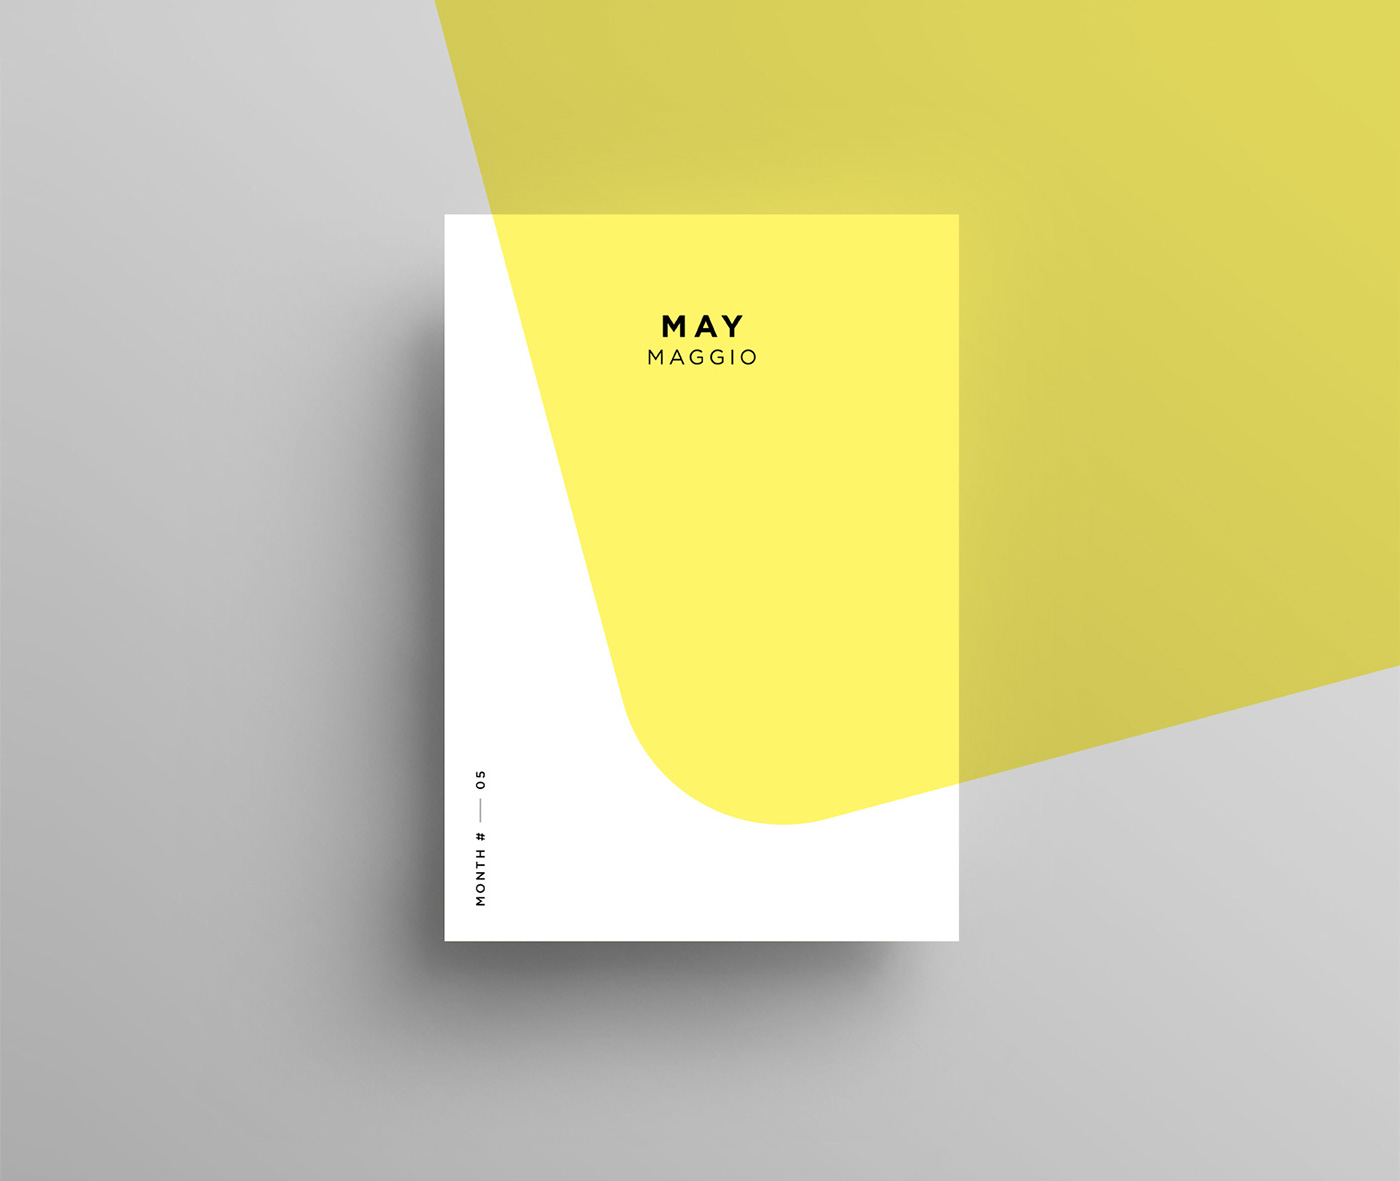 poster design minimal minimalist geometry Layout simple shapes colors Freelance